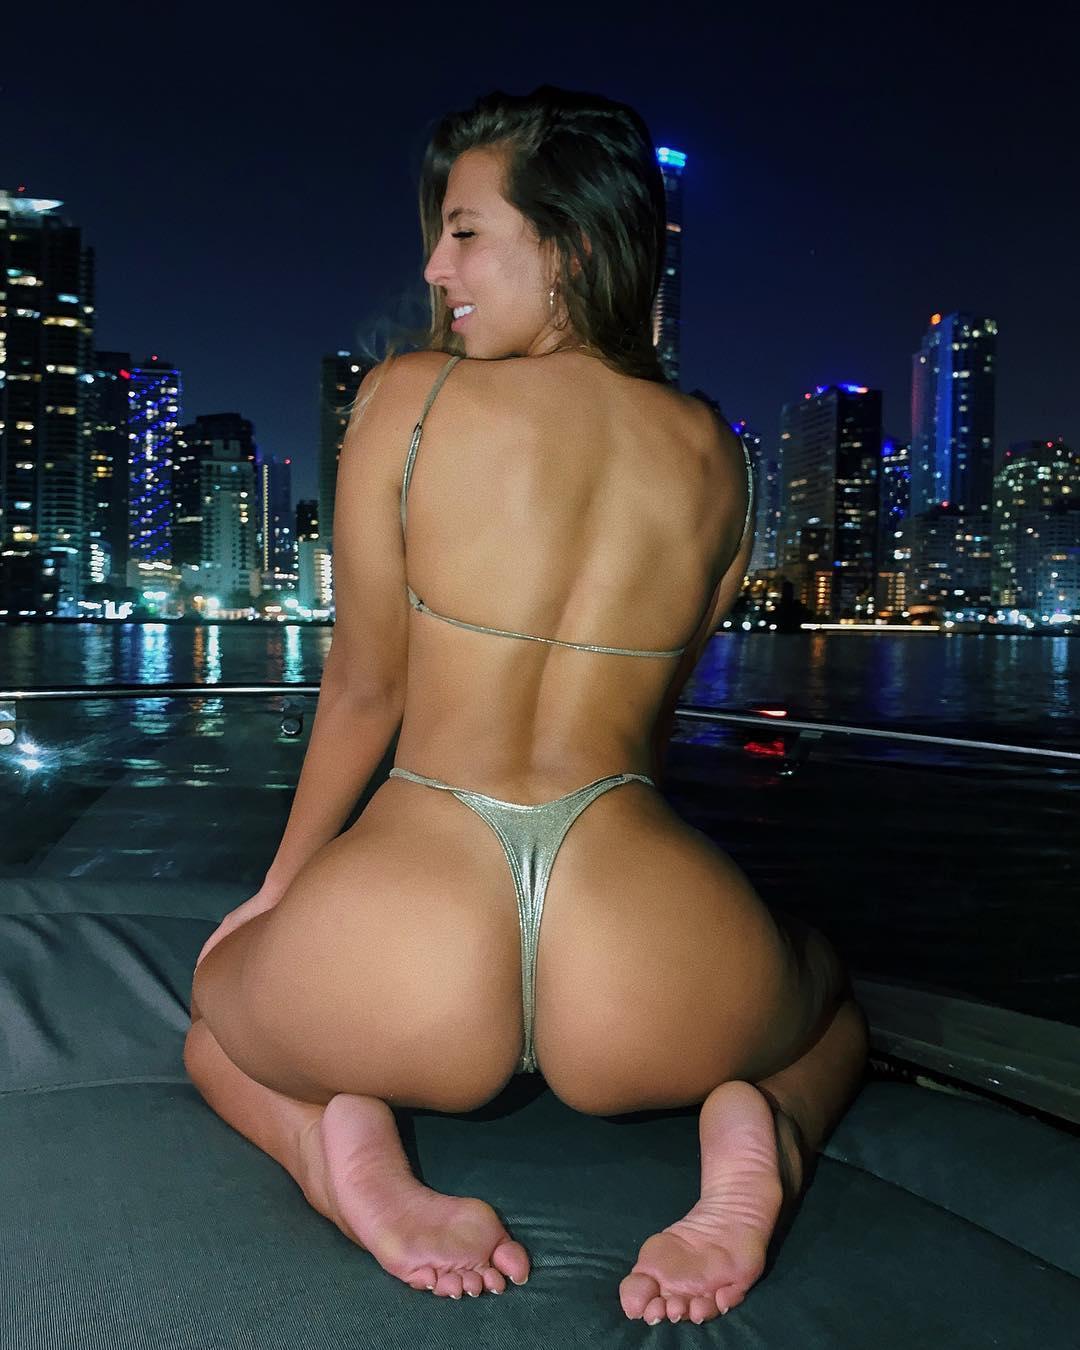 Natalia Garibotto Nude Onlyfans Leaked 0003